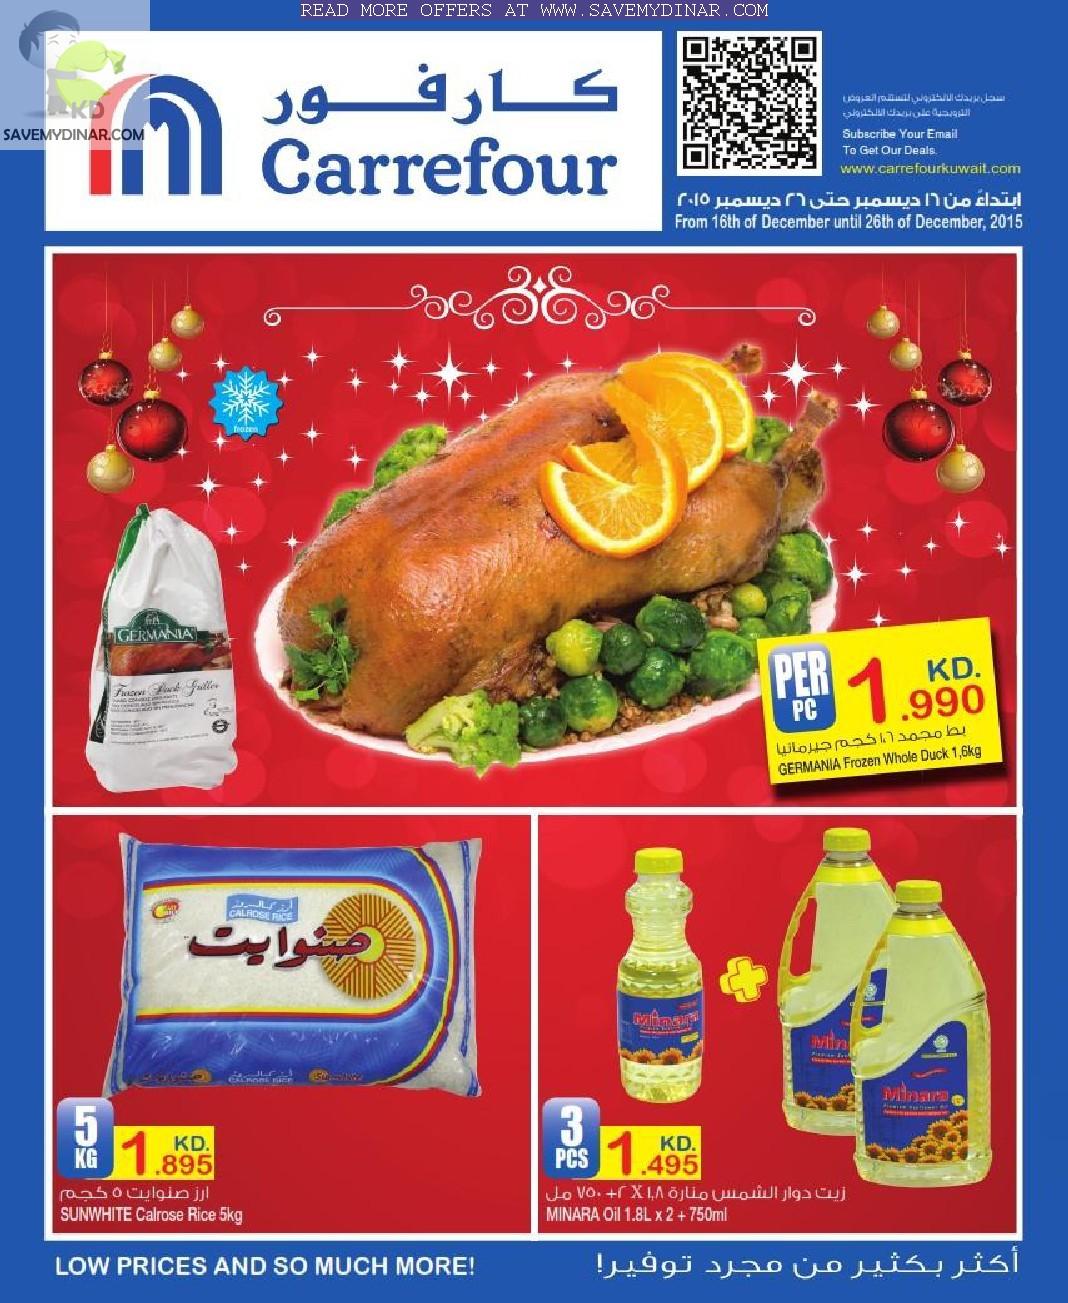 Carrefour Kuwait - Offers valid until 26th Dec, 2015 | SaveMyDinar